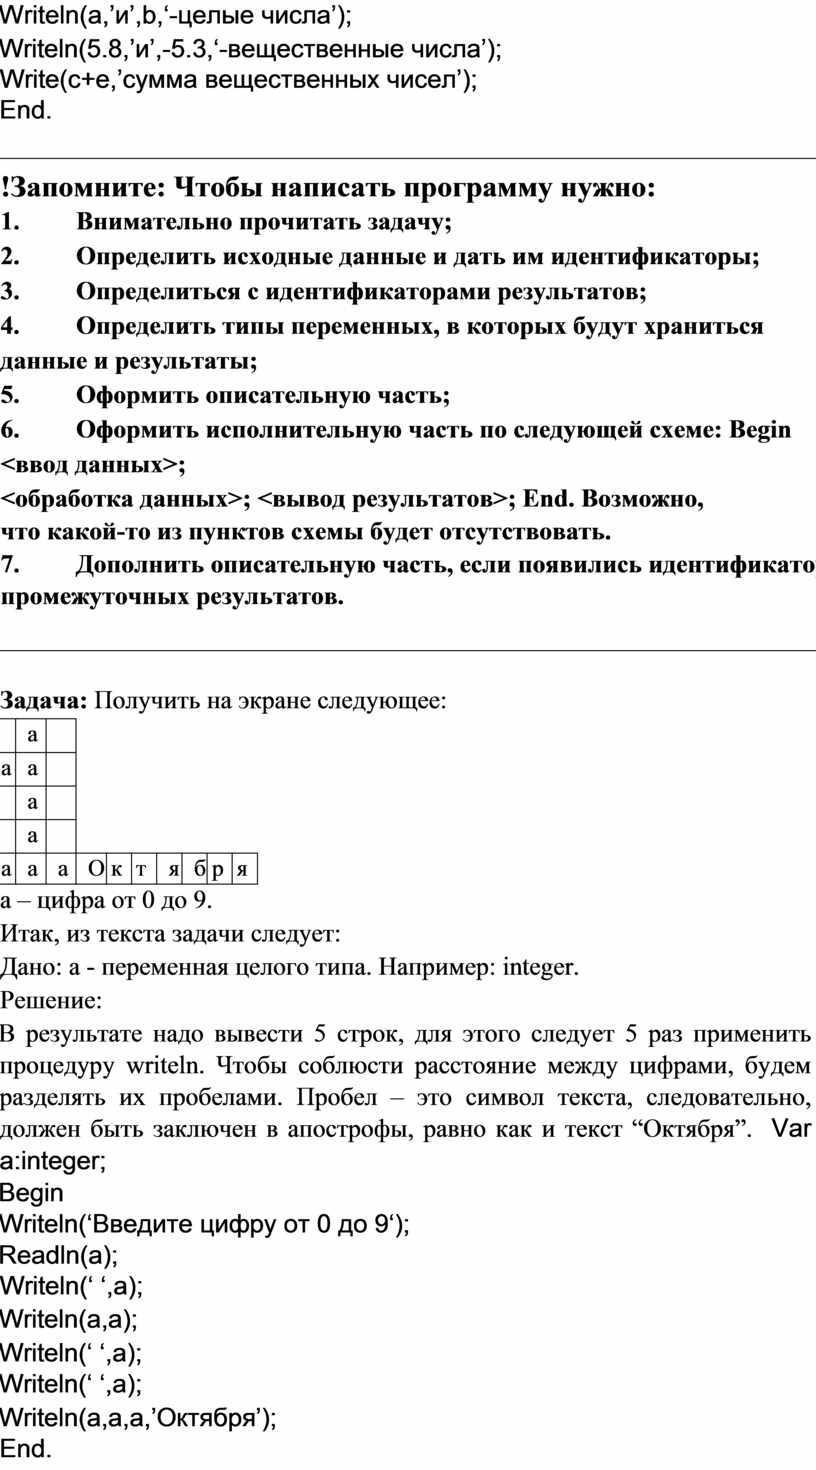 Writeln(a,'и',b,'-целые числа');